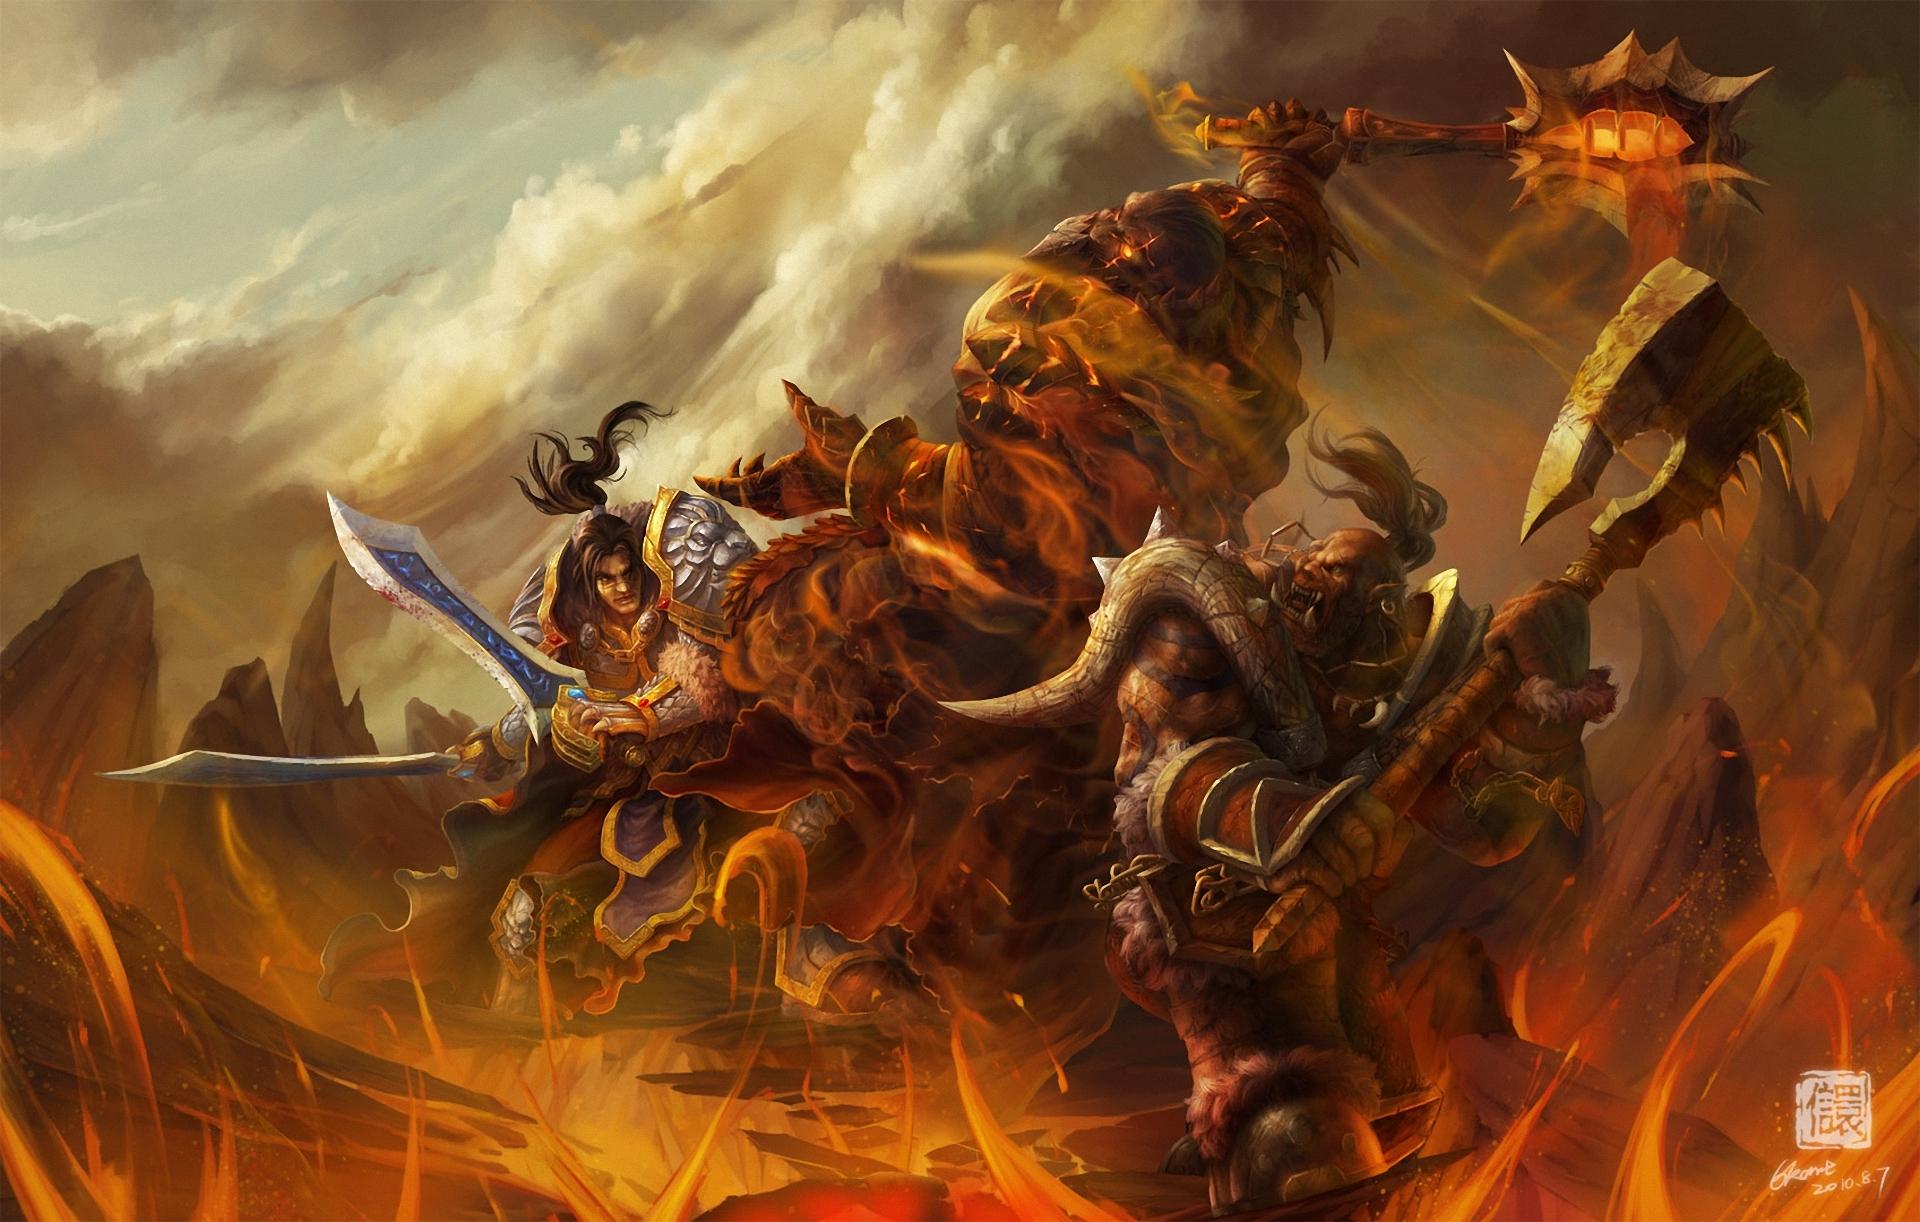 of WarCraft WoW Warrior Orc Battle Monster axe Games fantasy wallpaper 1920x1222